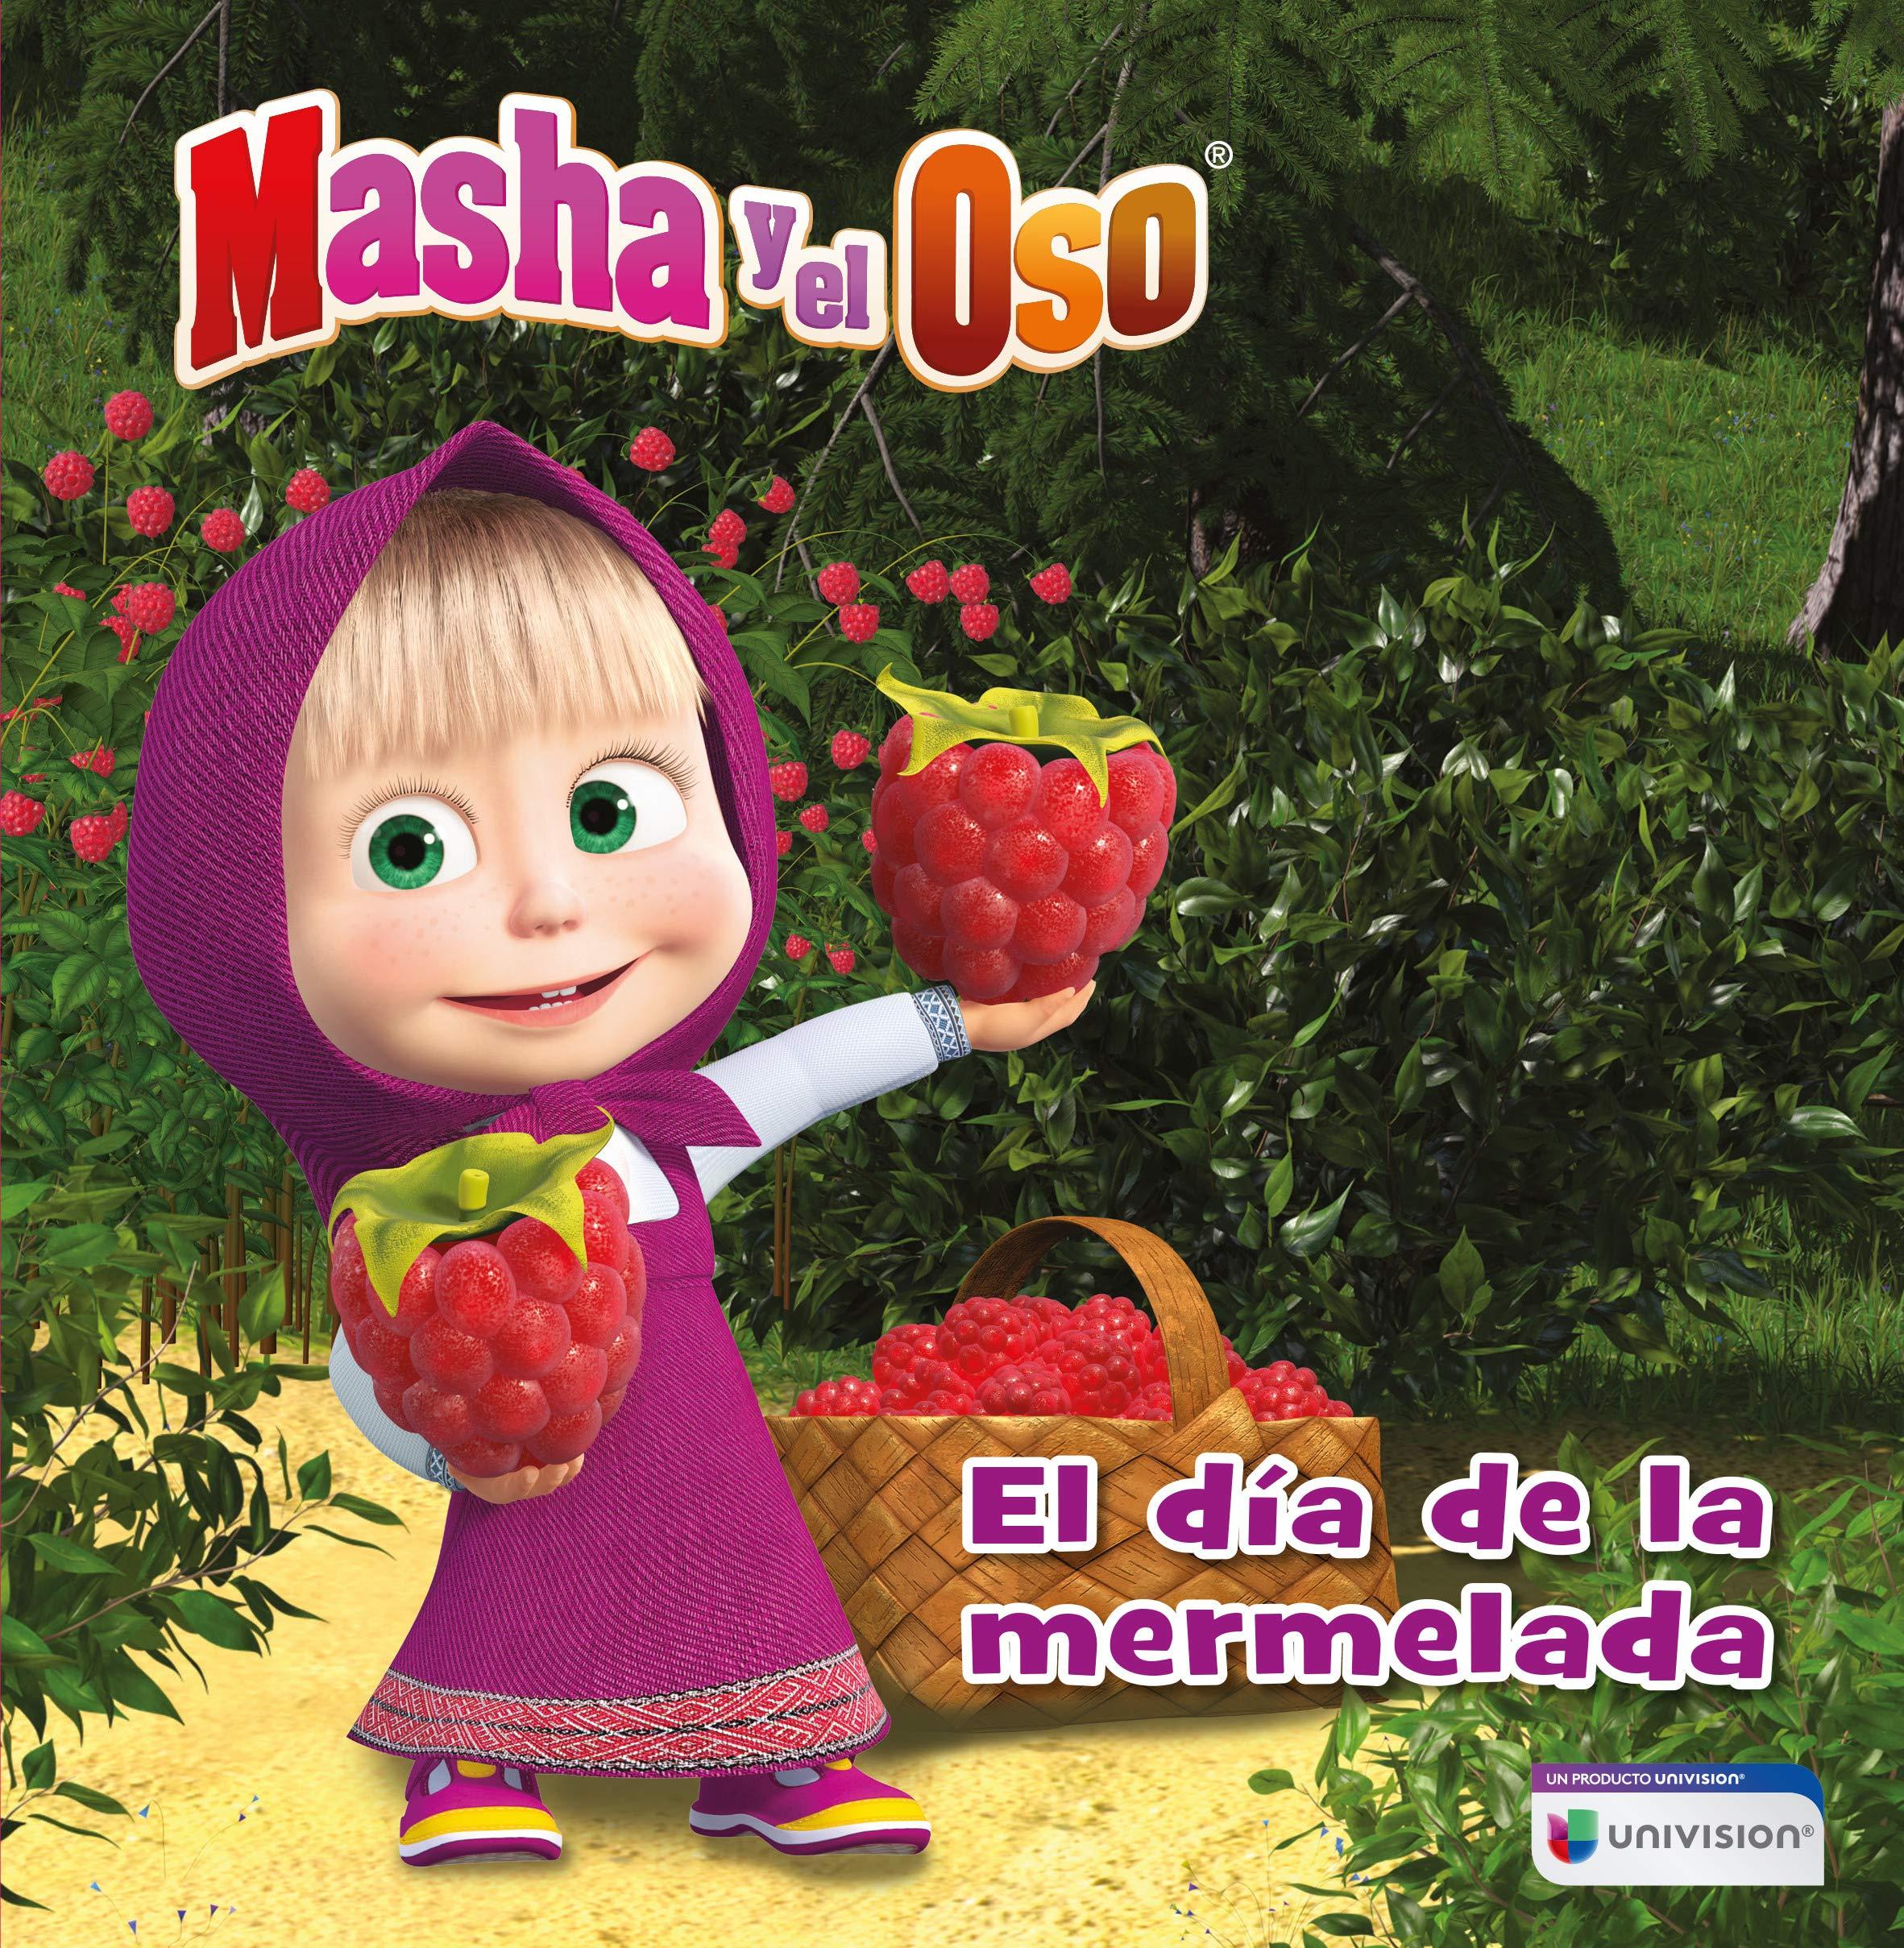 masha and the bear in spanish